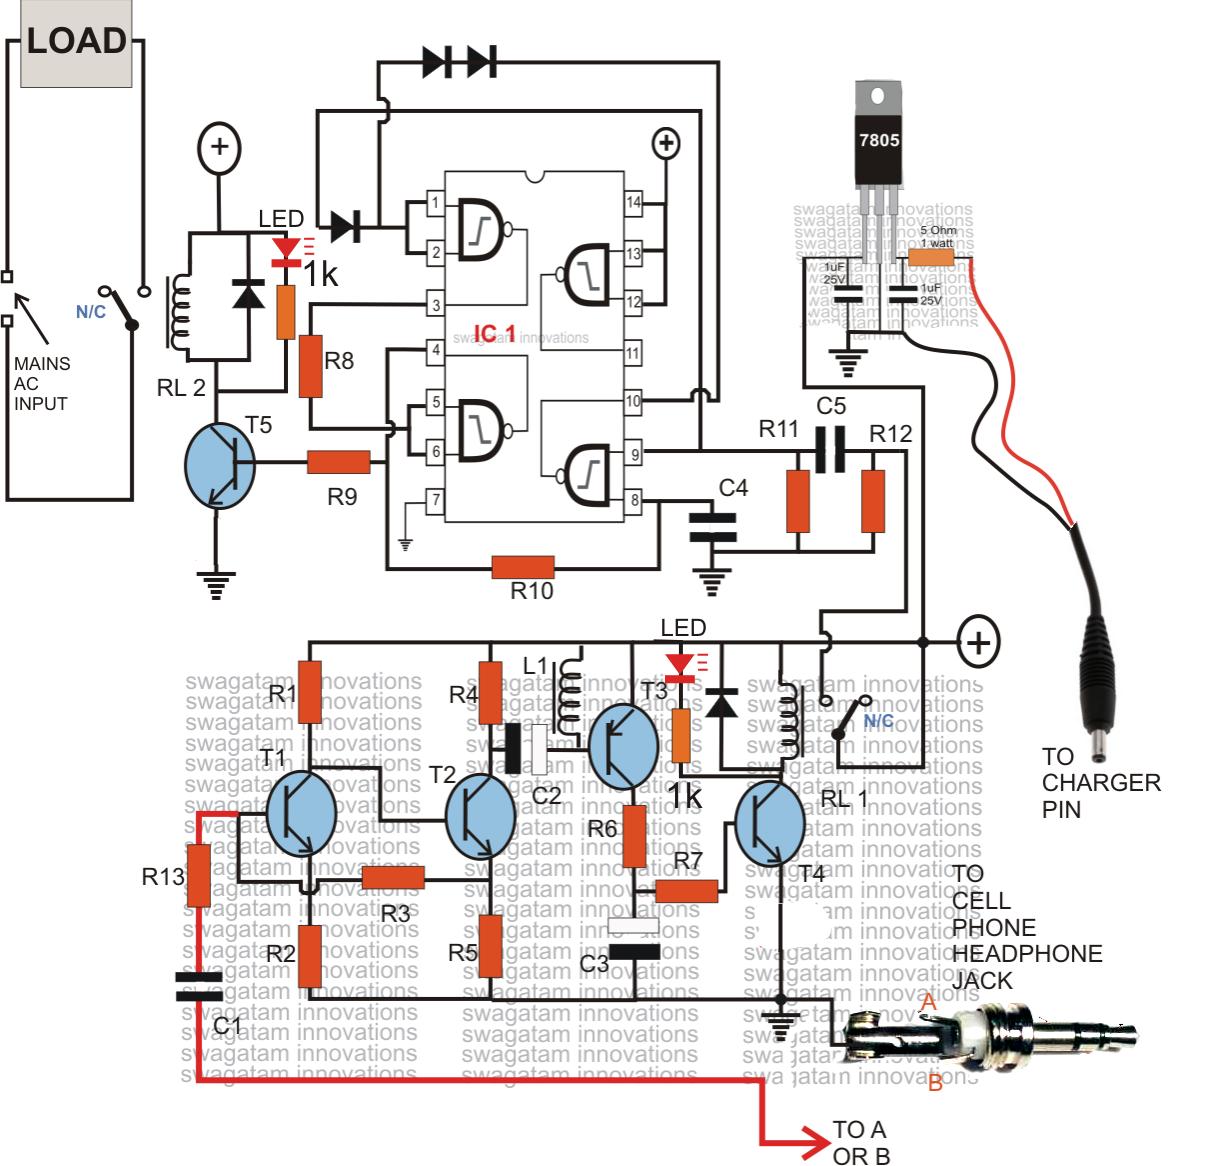 wiring diagram for phone jack transform boundary rj11 org tr